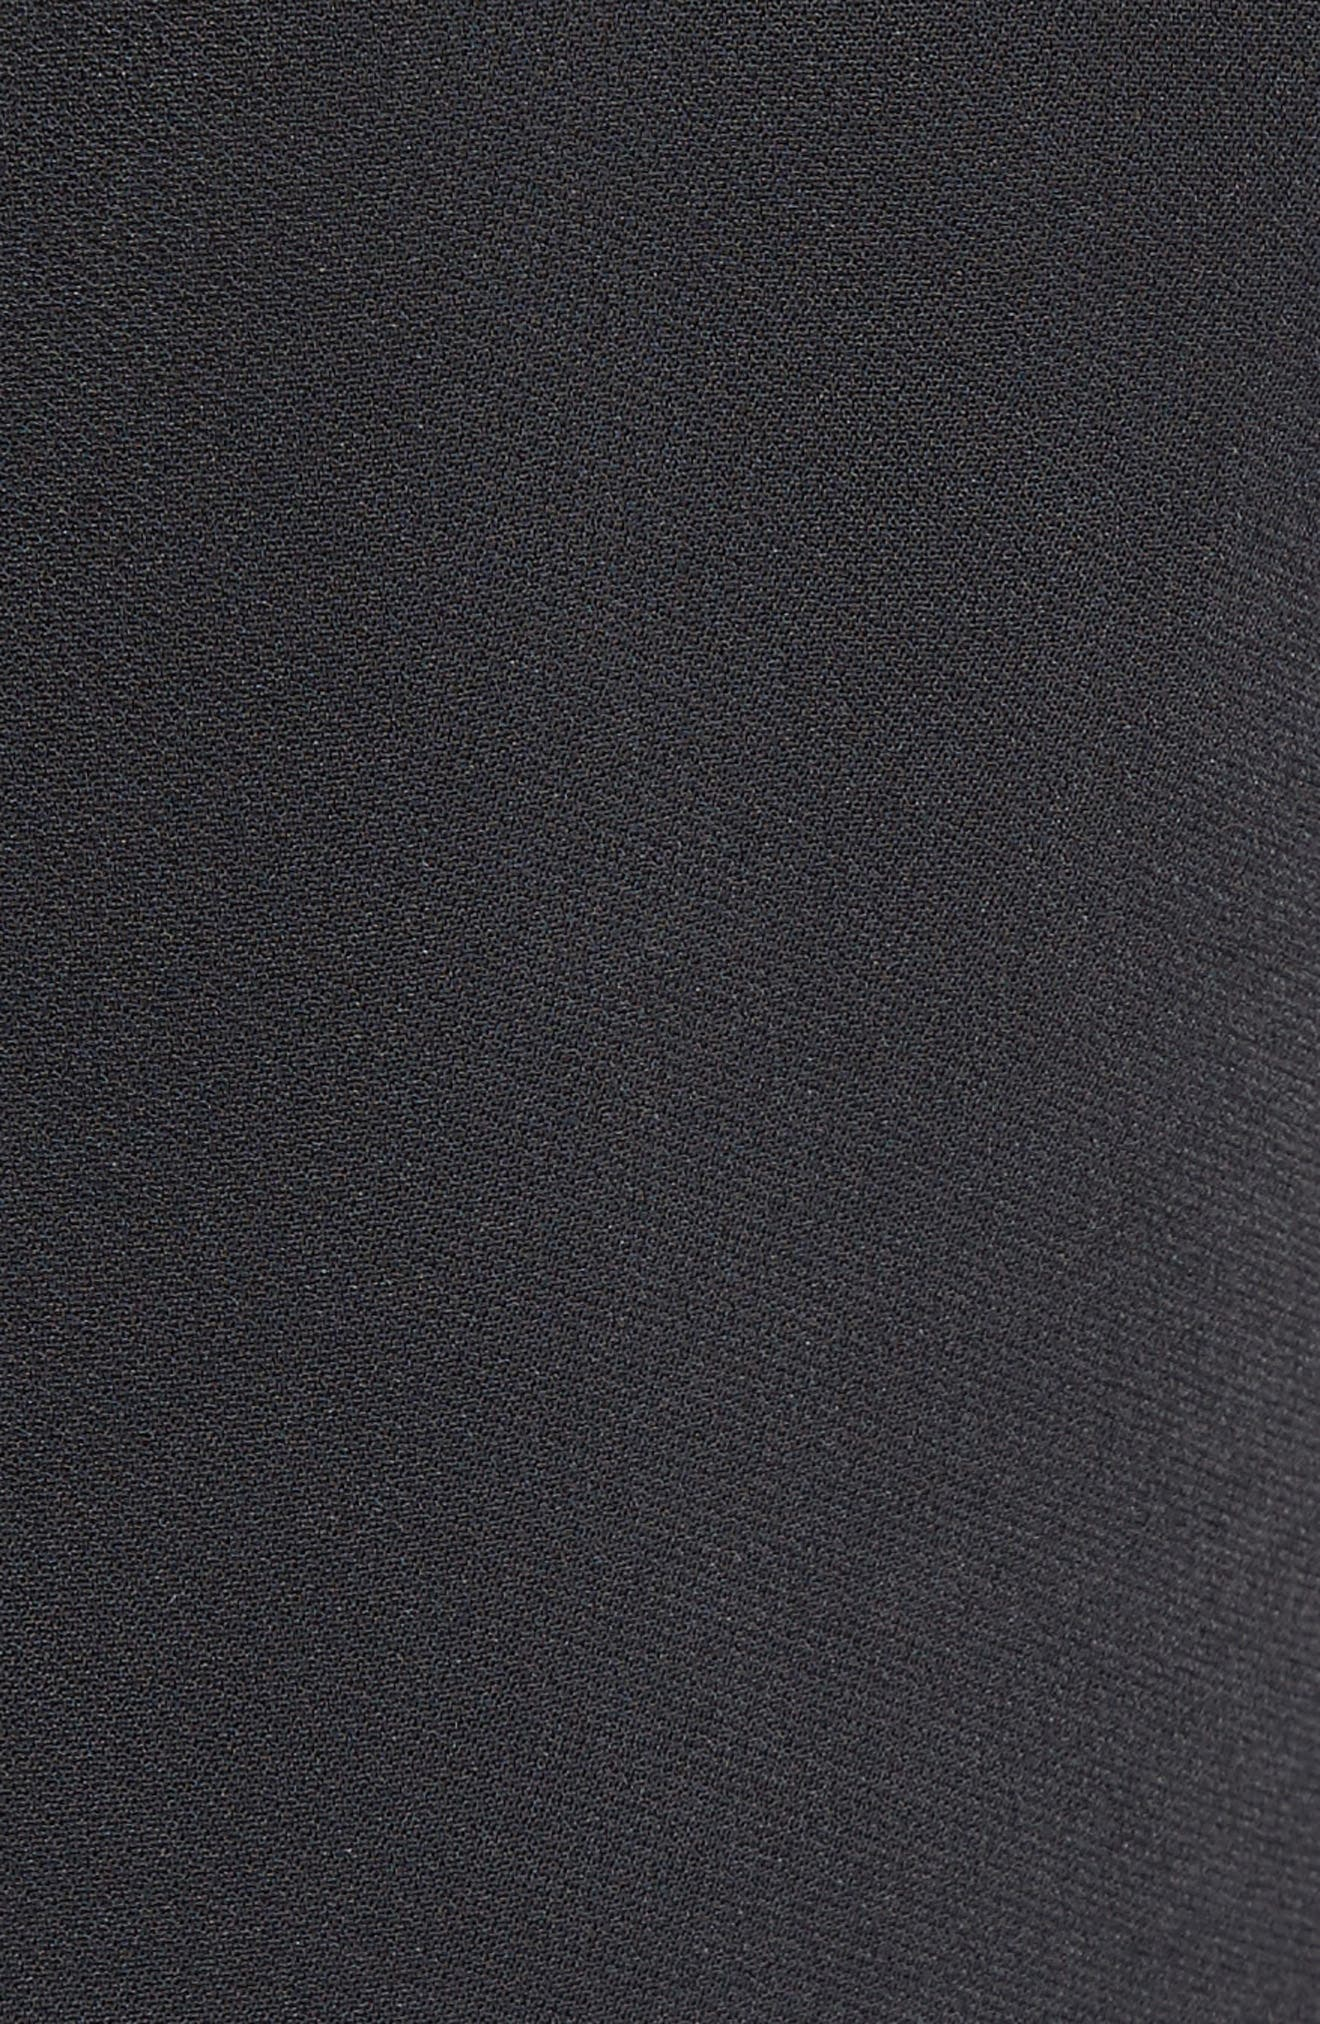 Pleated Fit & Flare Minidress,                             Alternate thumbnail 3, color,                             Black